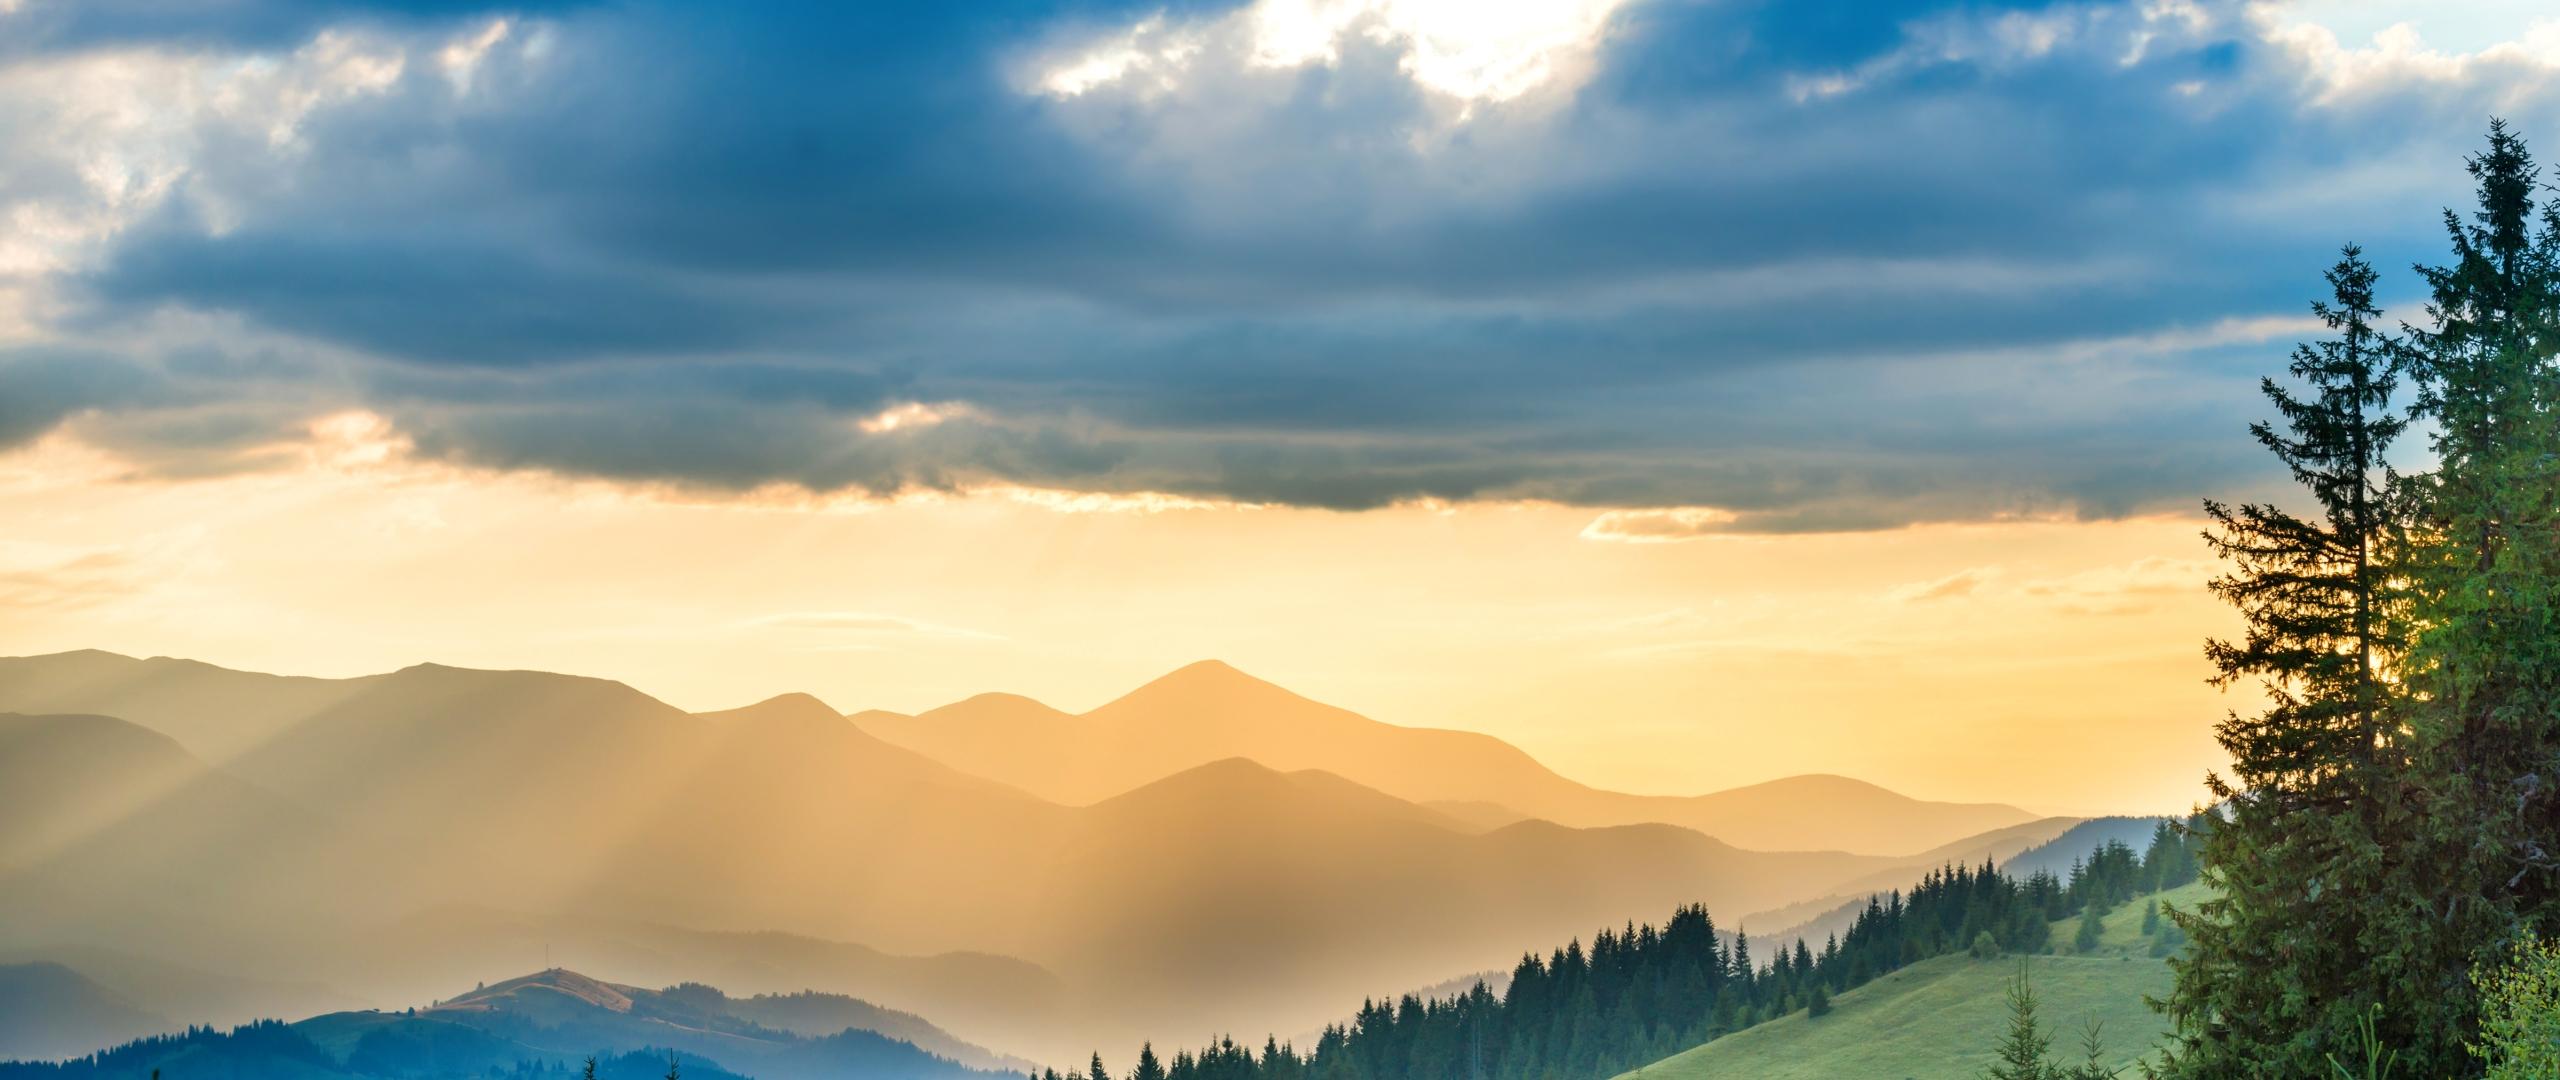 2560x1080 landscape mountains sunbeam nature 2560x1080